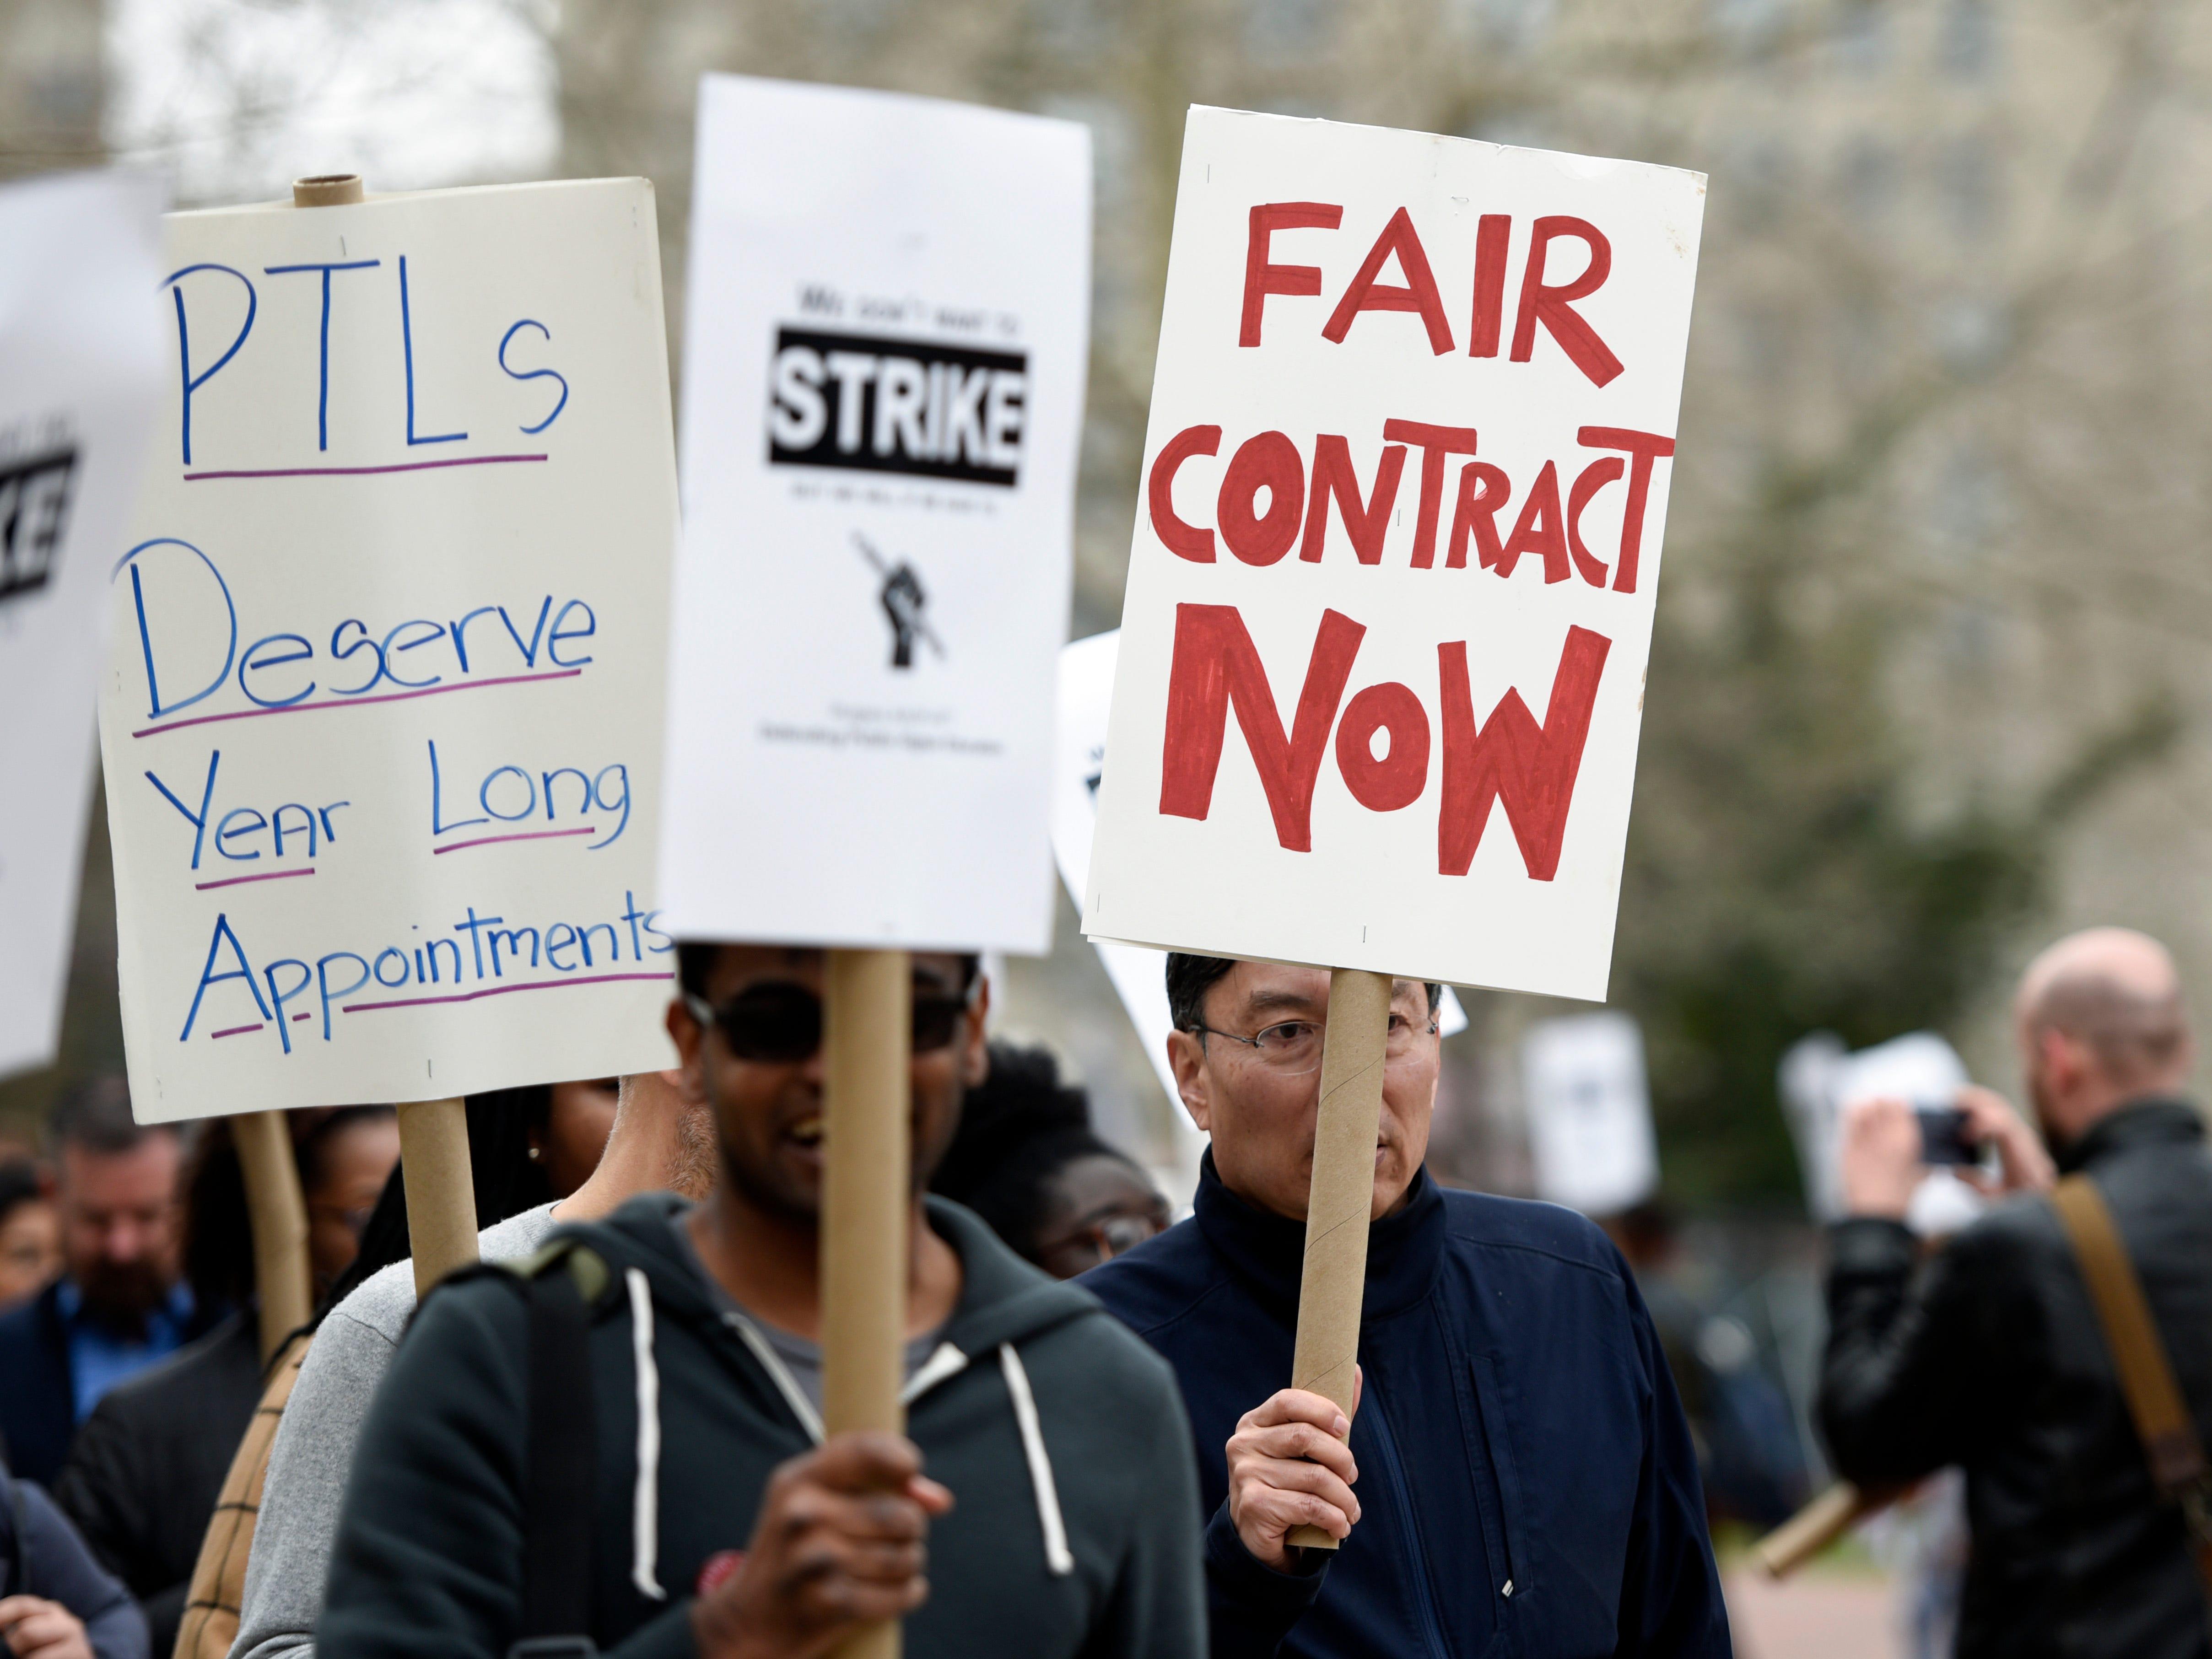 With contract talks making progress, Rutgers University professors postpone strike